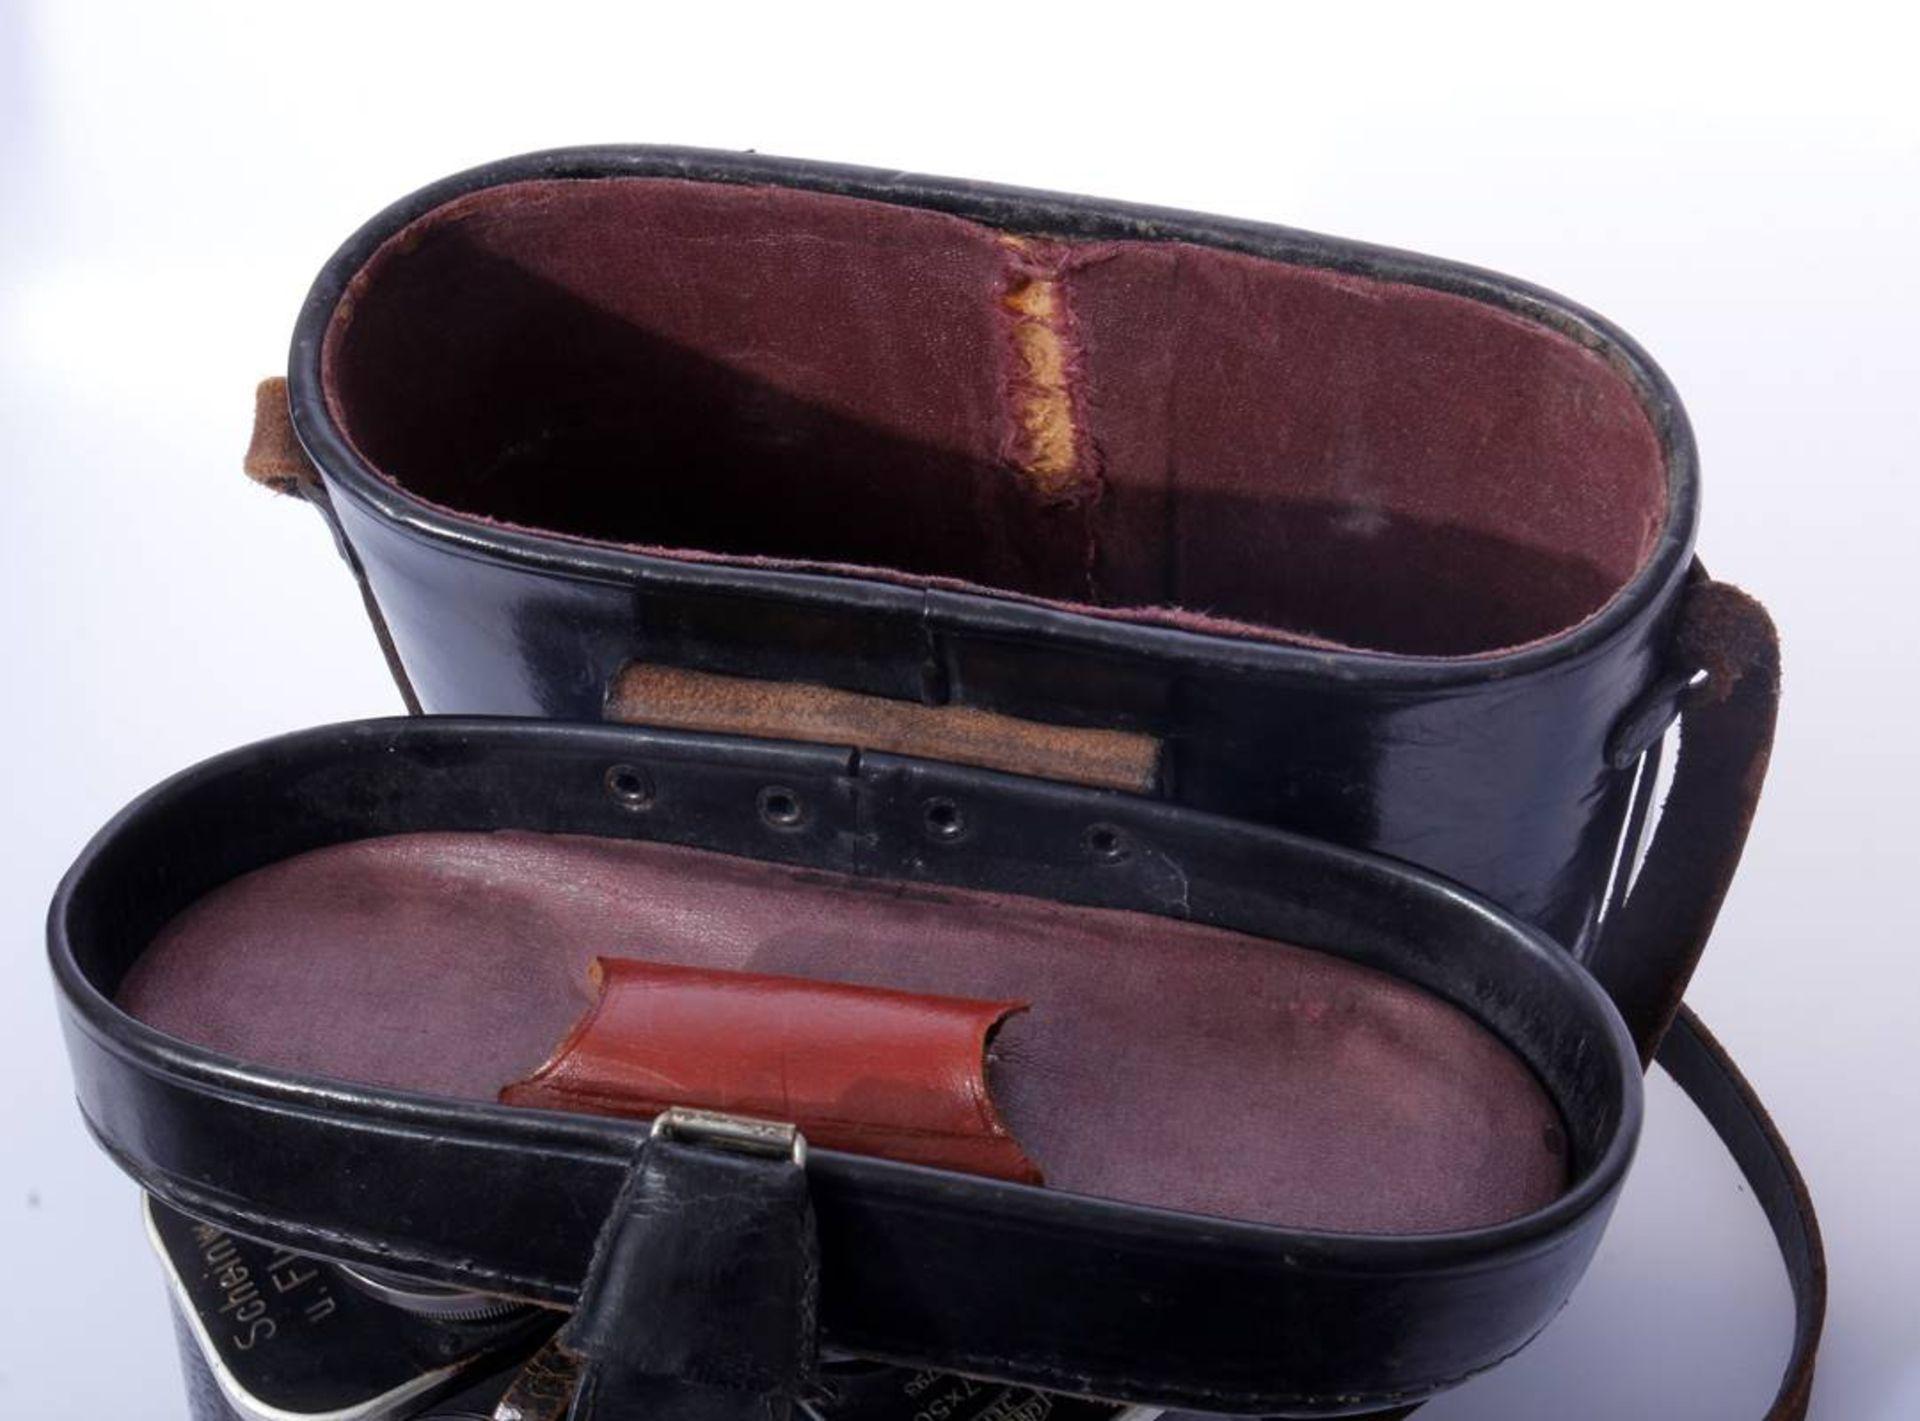 Marinefernglas DE 7 x 50Schwarzes Marinefernglas 7 x 50 DE Karl Zeiss Jena mit Abnahmestempel, - Bild 2 aus 7